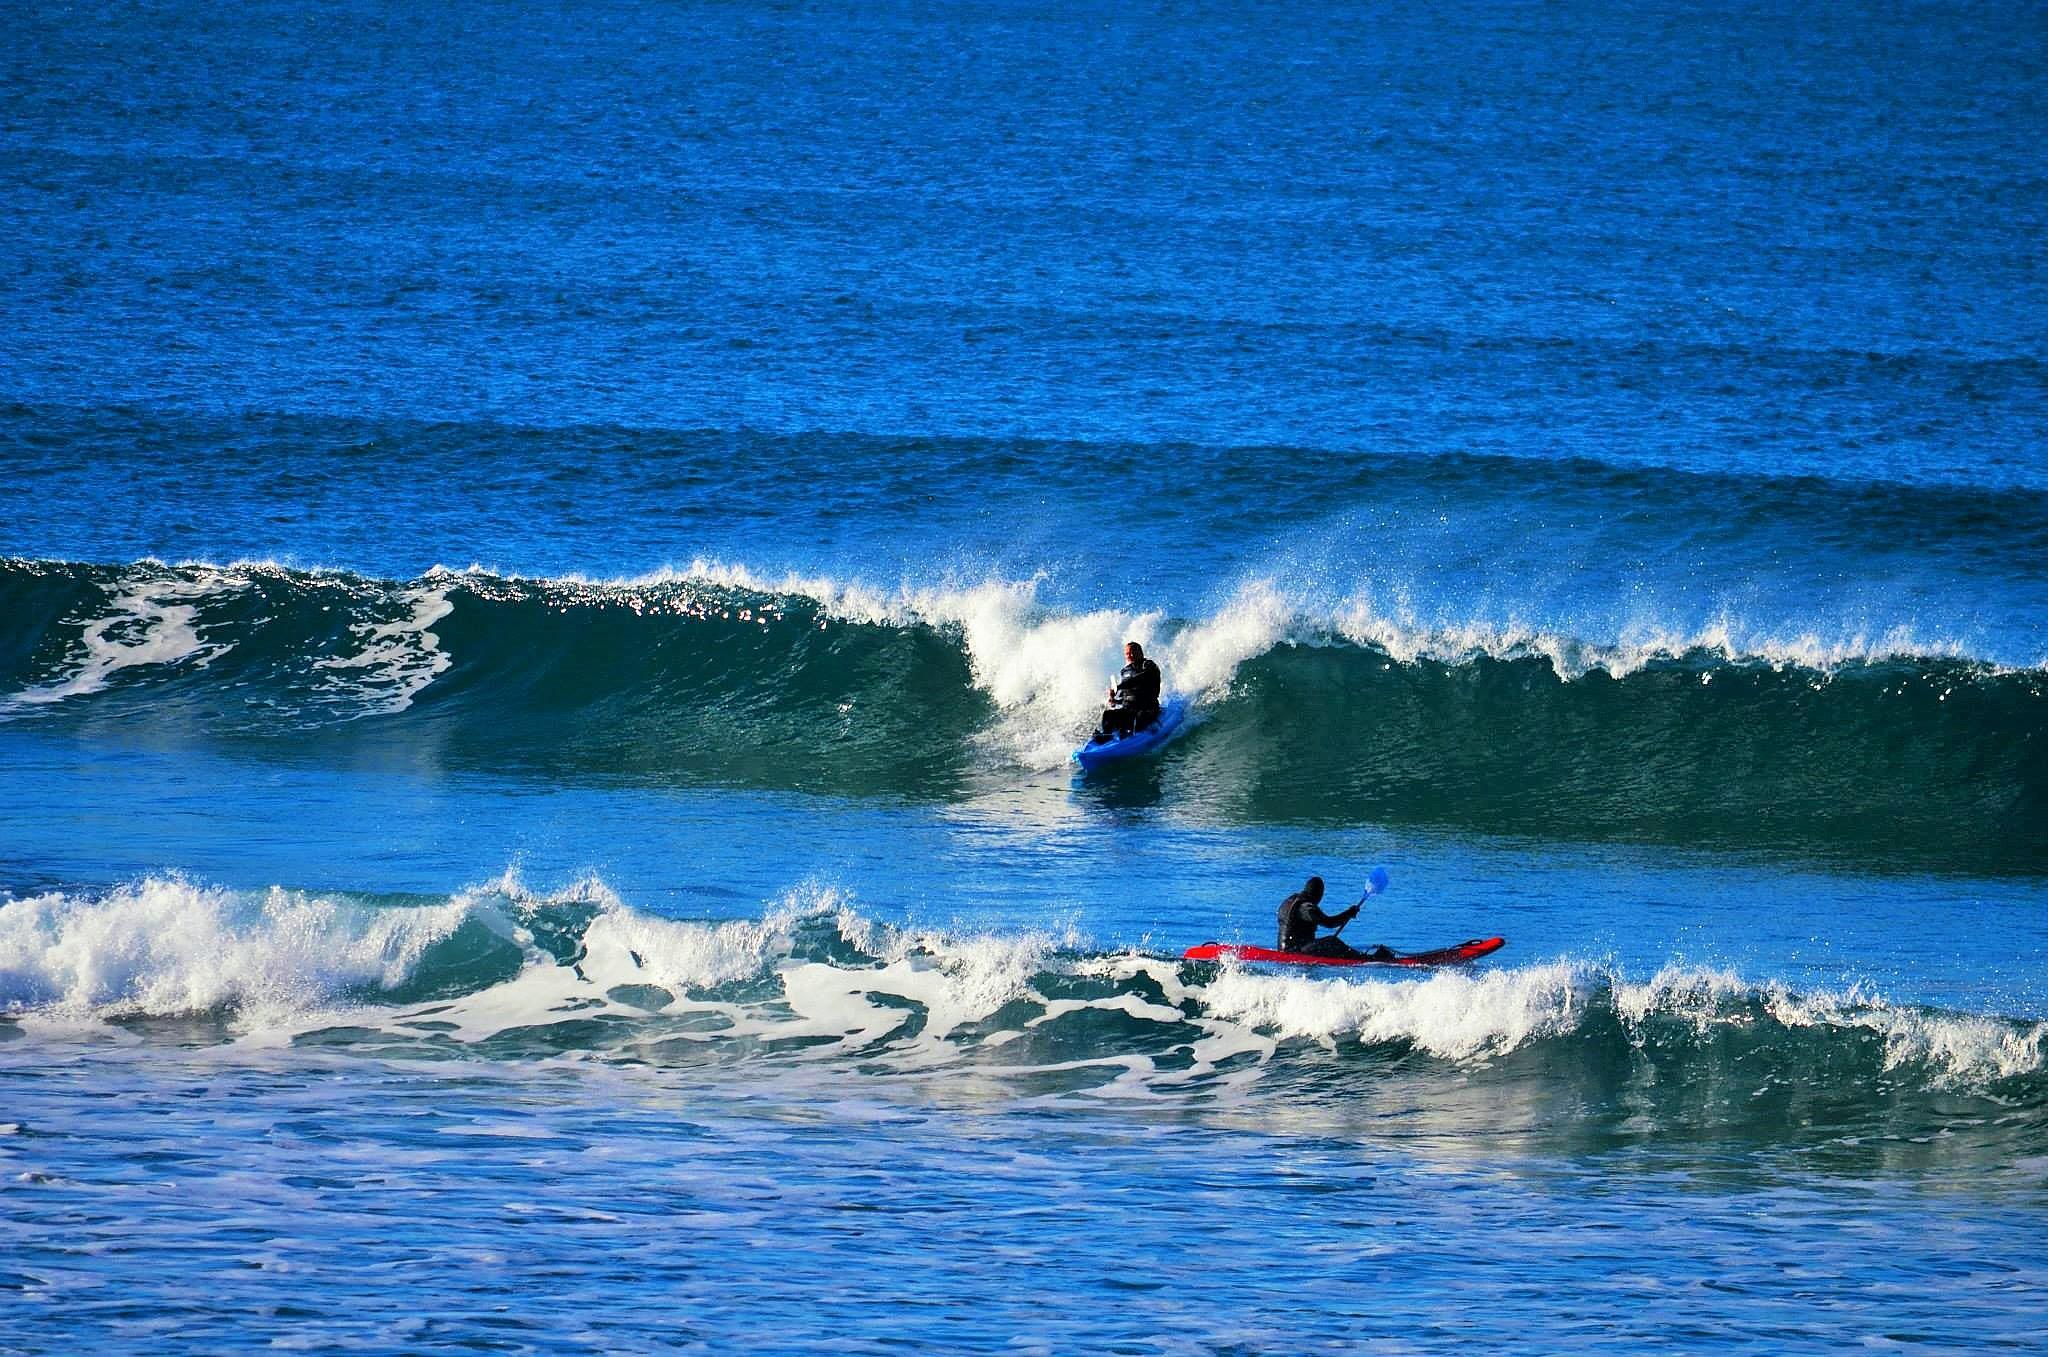 Kayak on the Oregon Coast by Boonietunes